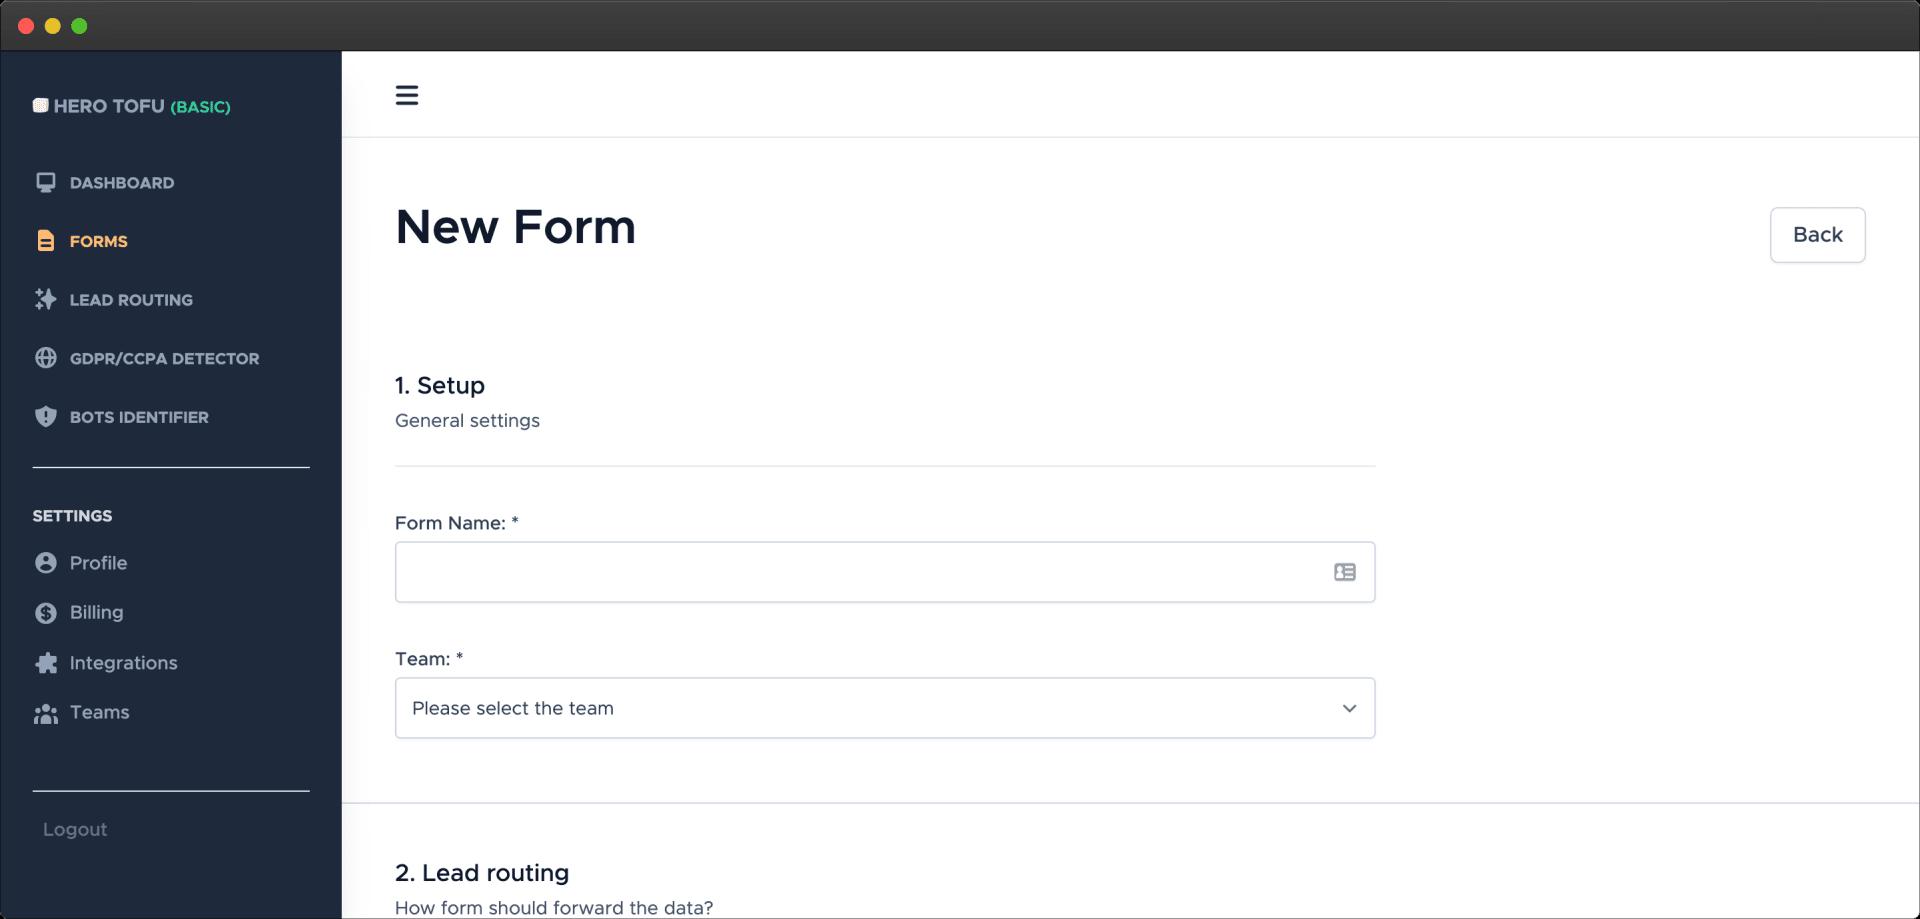 Herotofu new form top